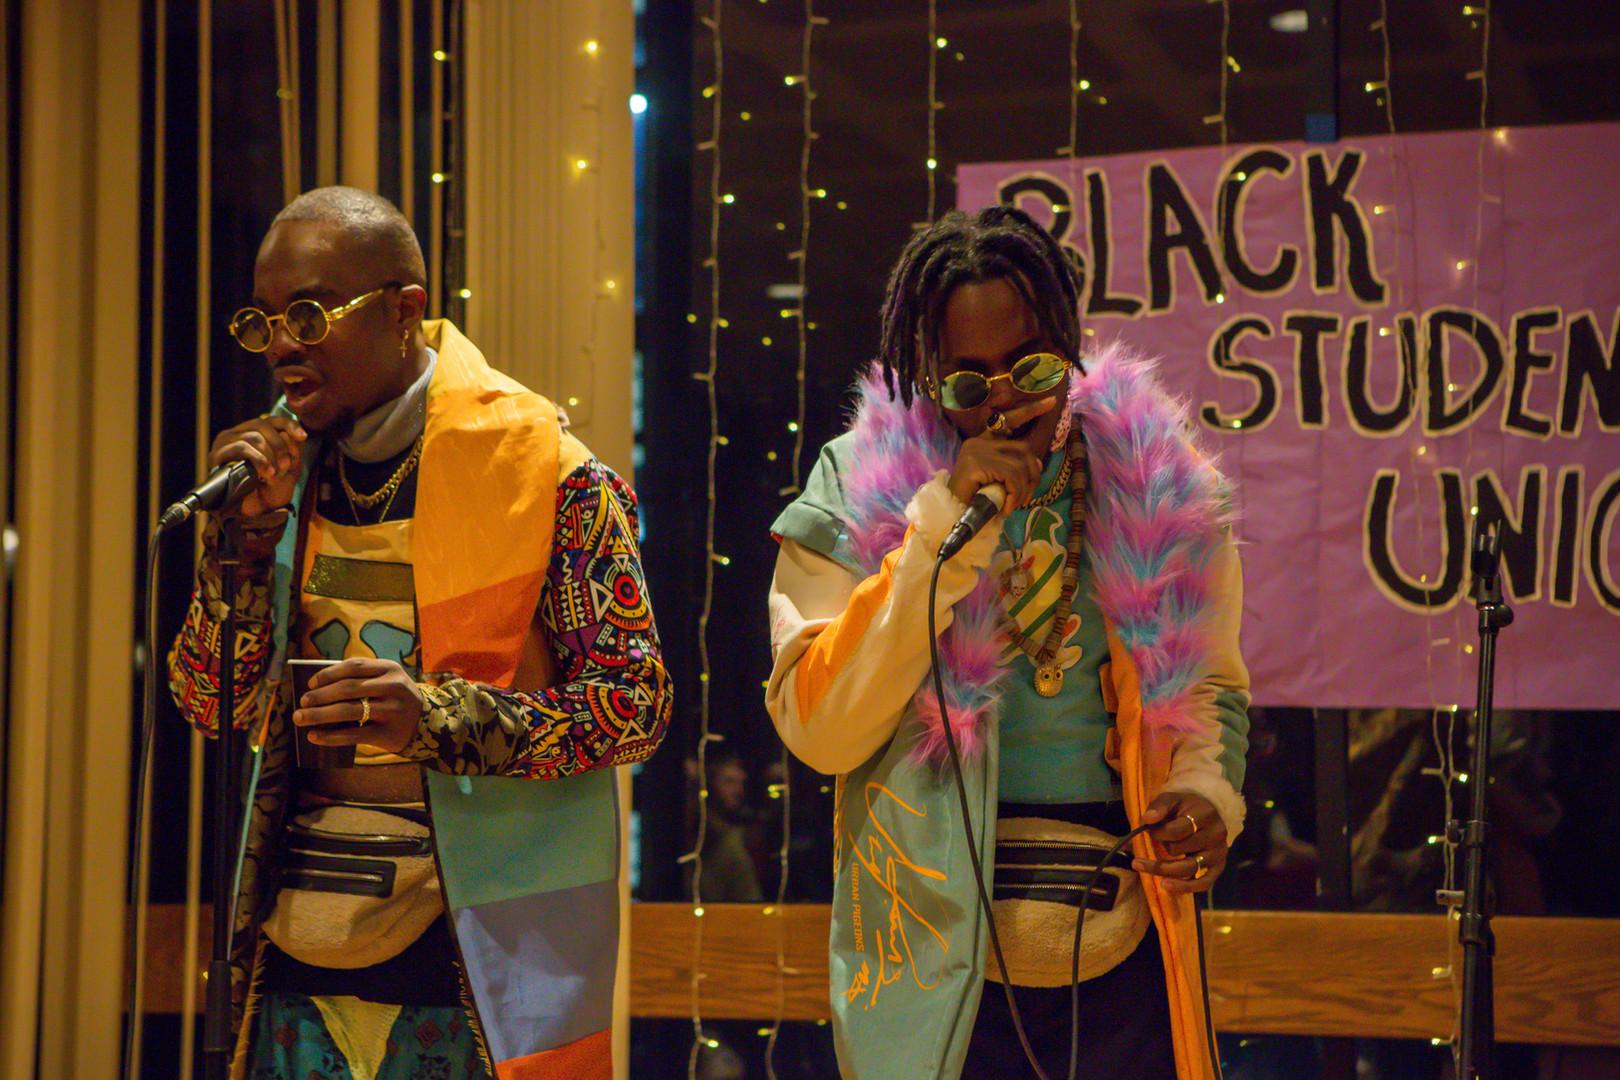 72 - 2019-Black-Student-Union-Arts-Explo